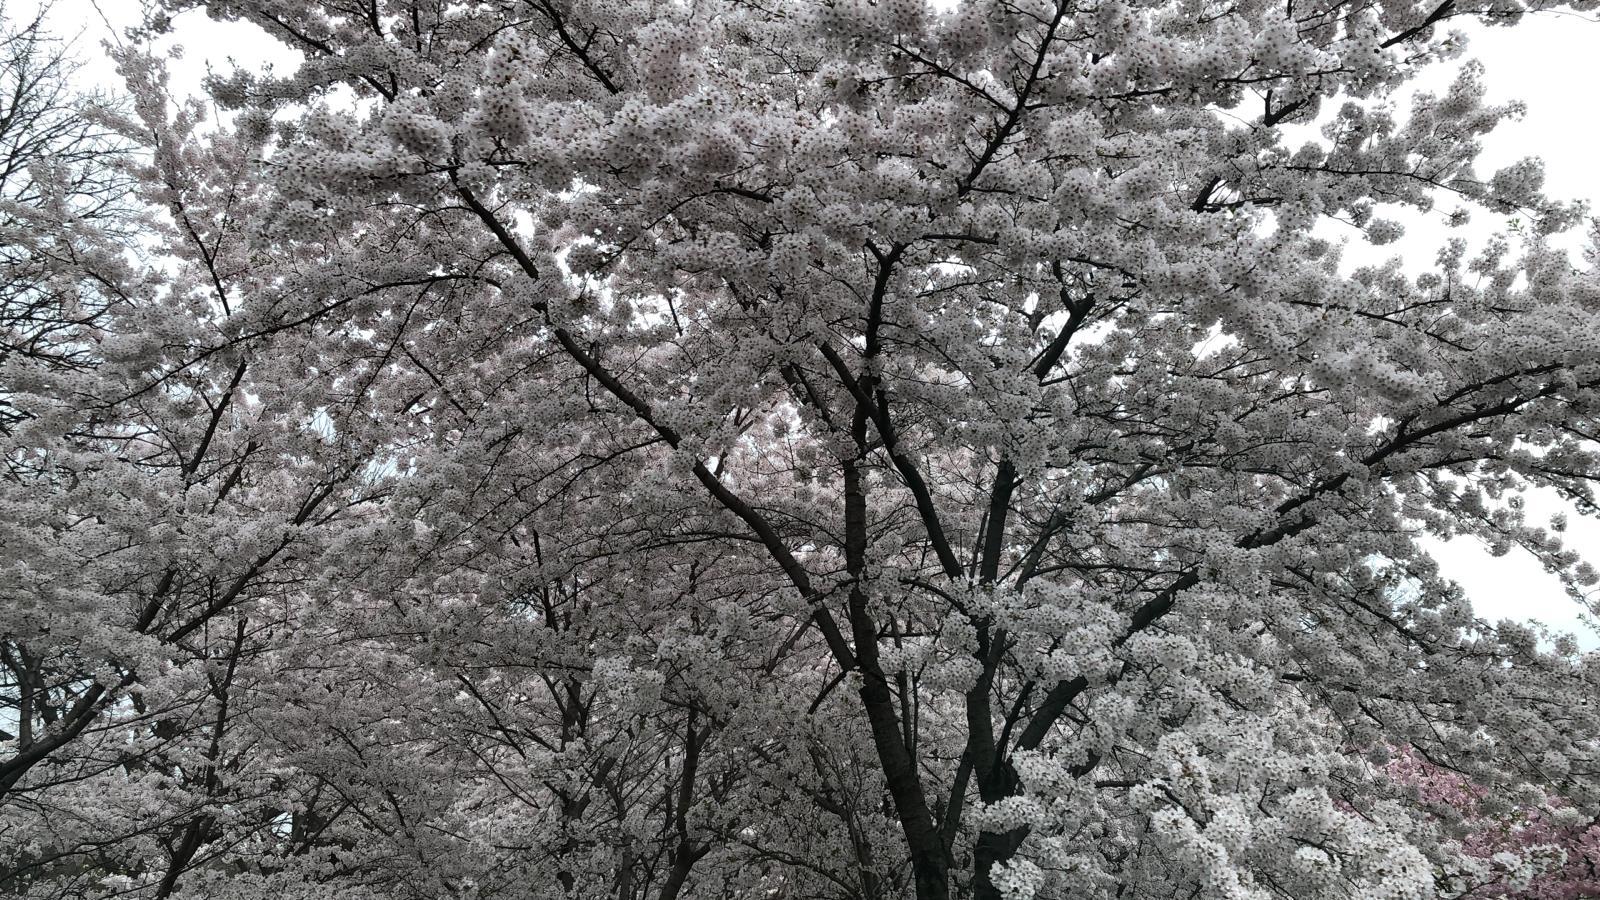 Branch Brook Park Cherry Blossom Festival April 14, 2019